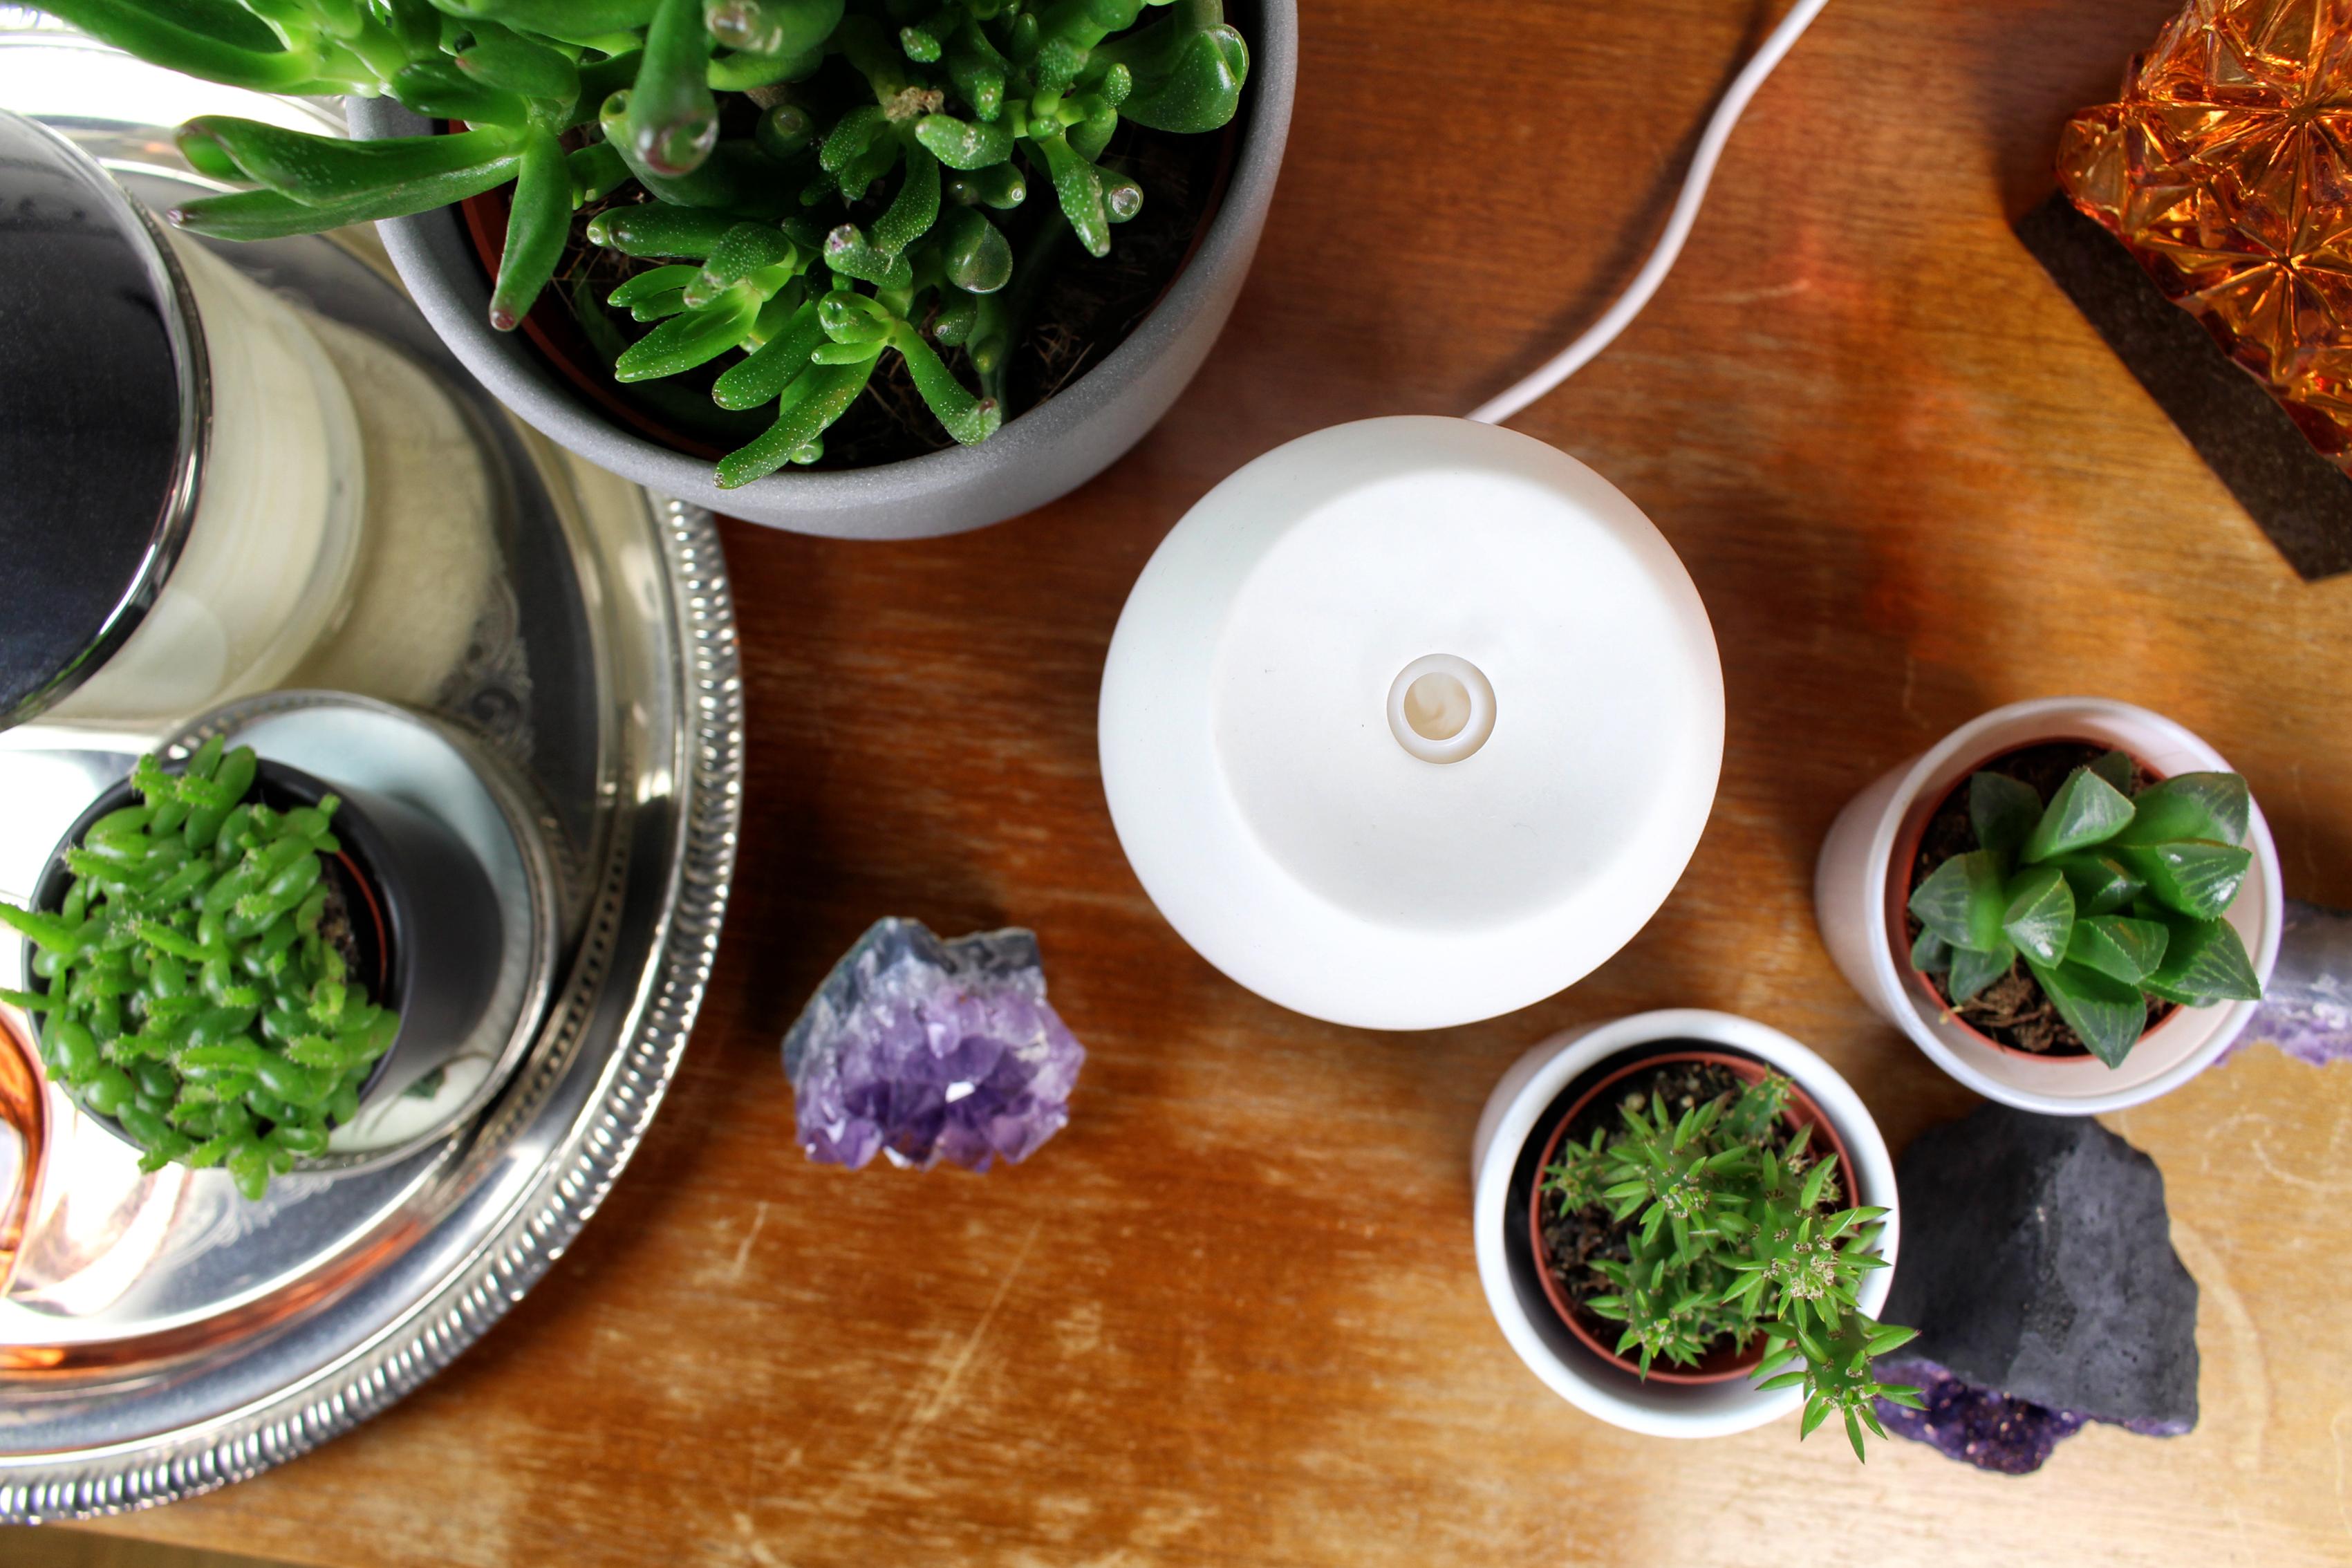 primavera-aroma-vernebler-ambiente-aroma-diffuser